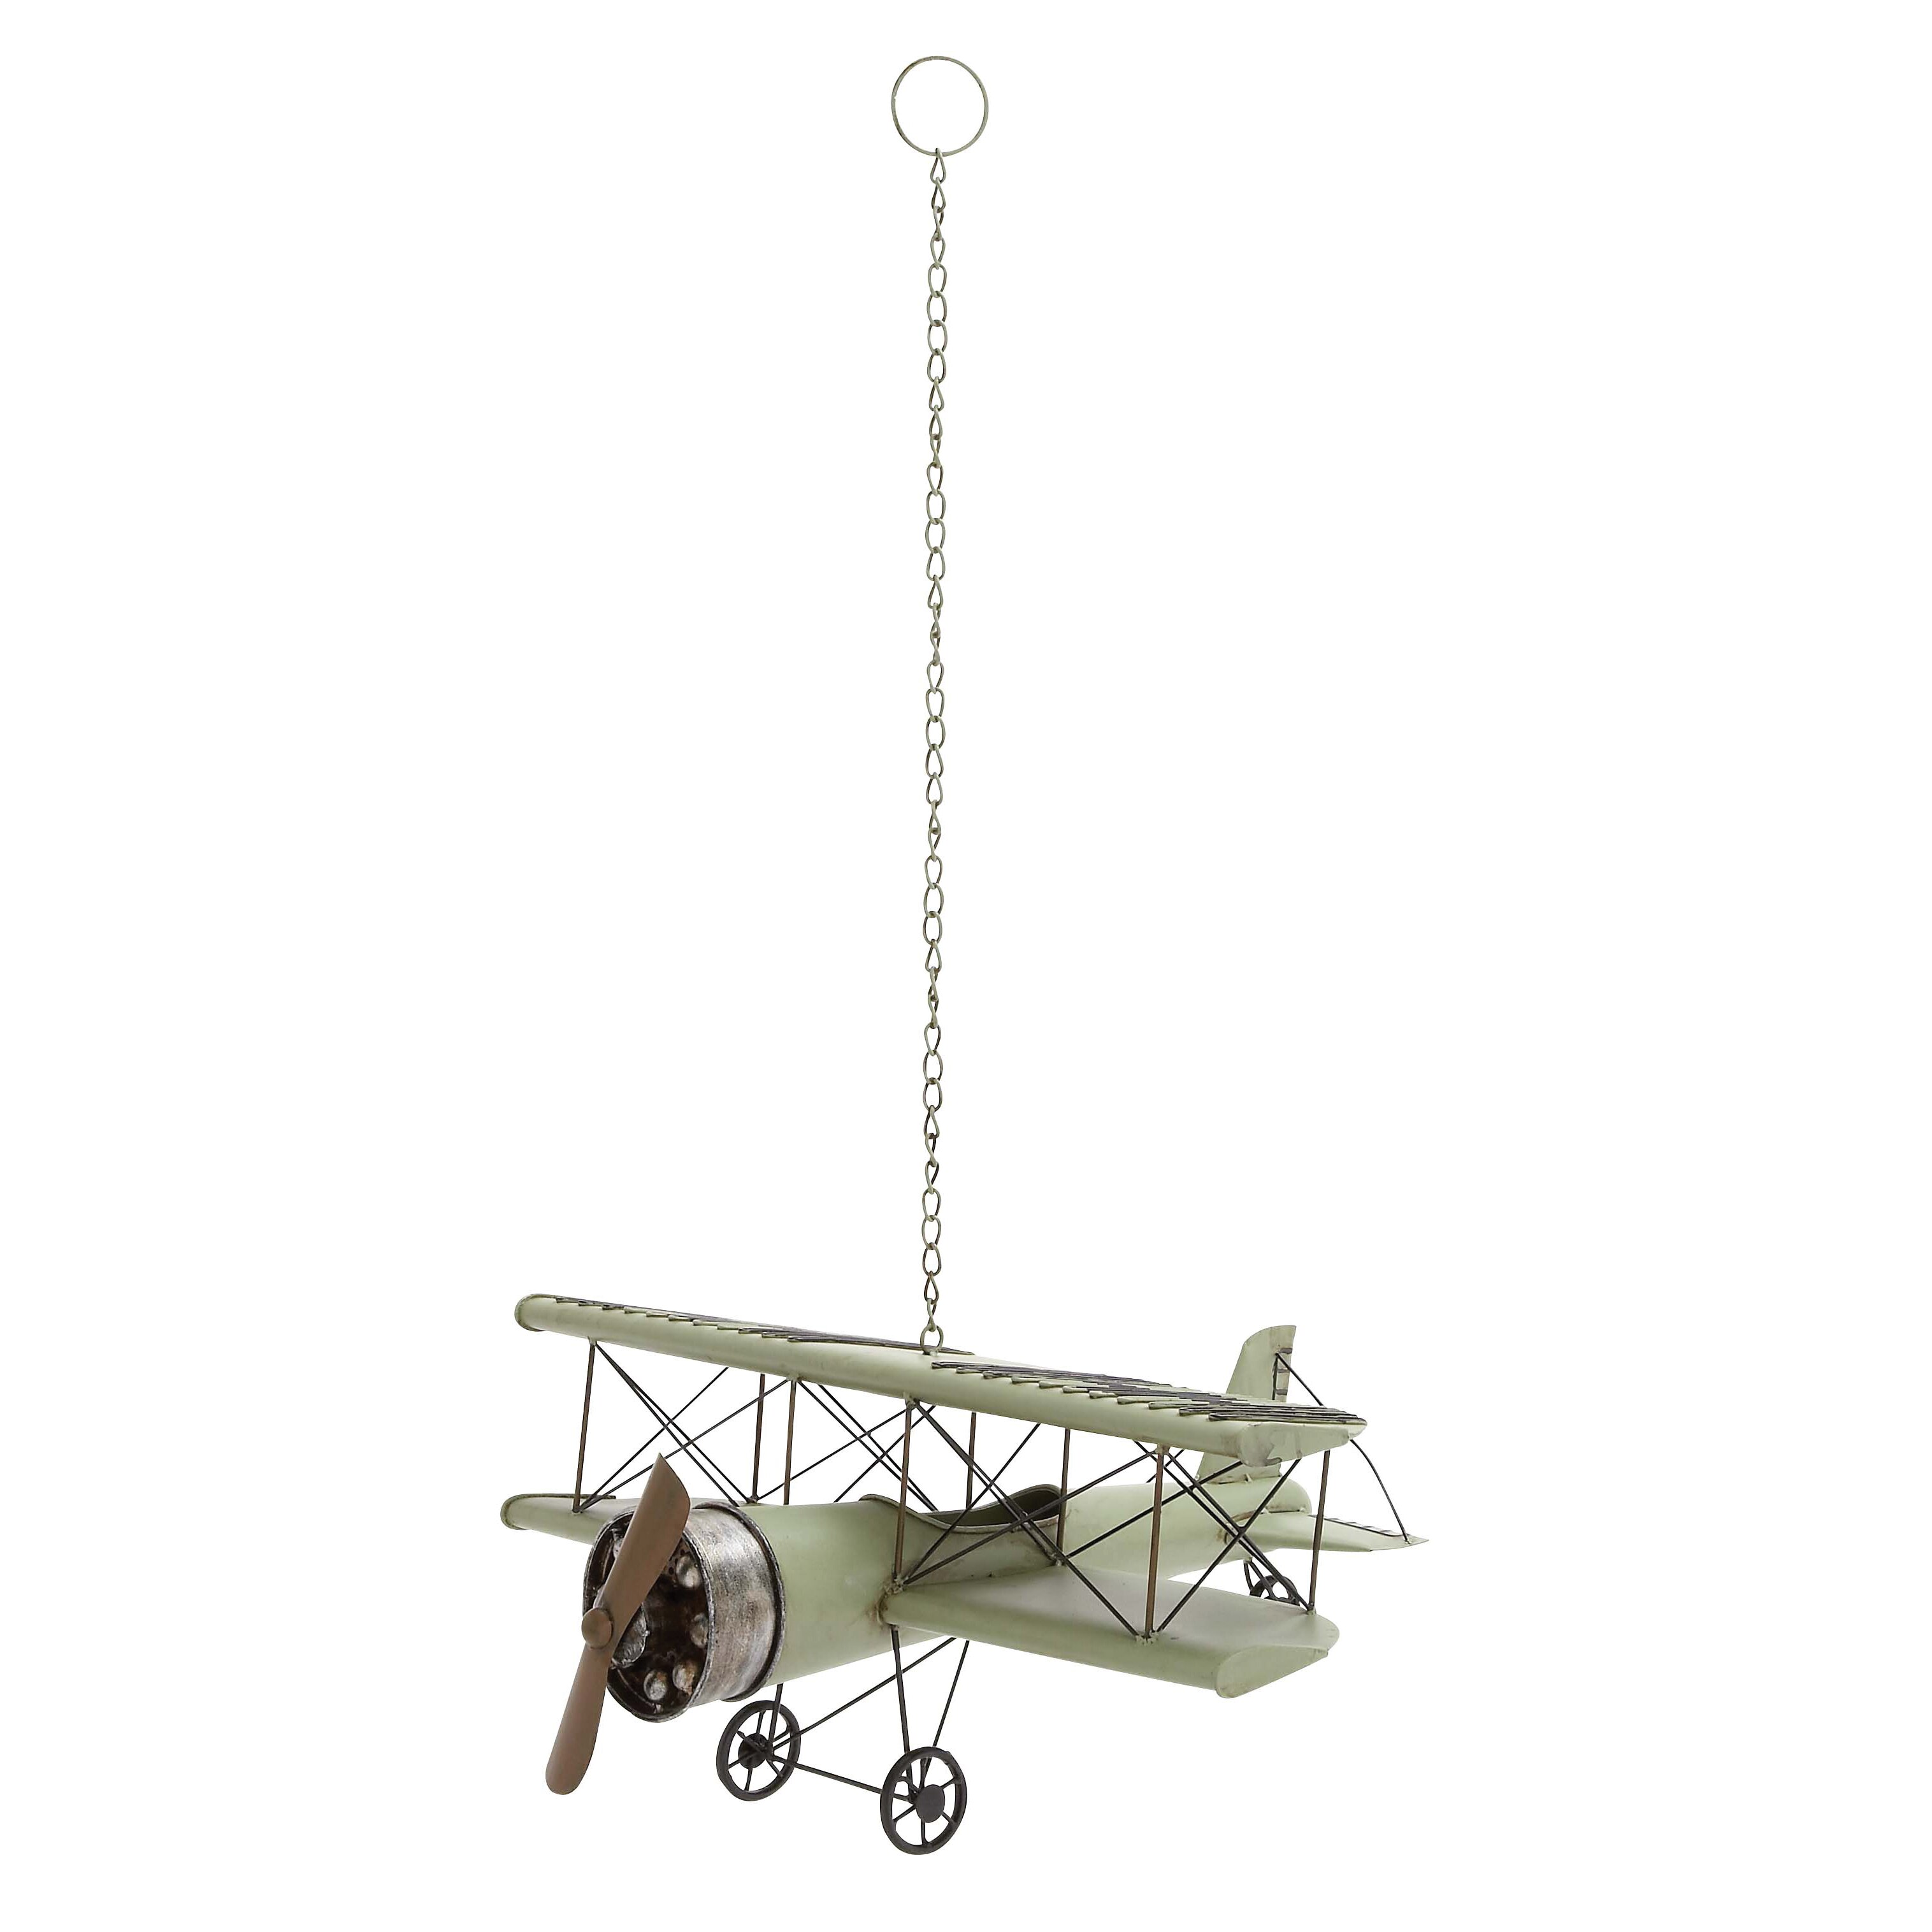 Woodland imports vintage sea bi airplane model sculpture